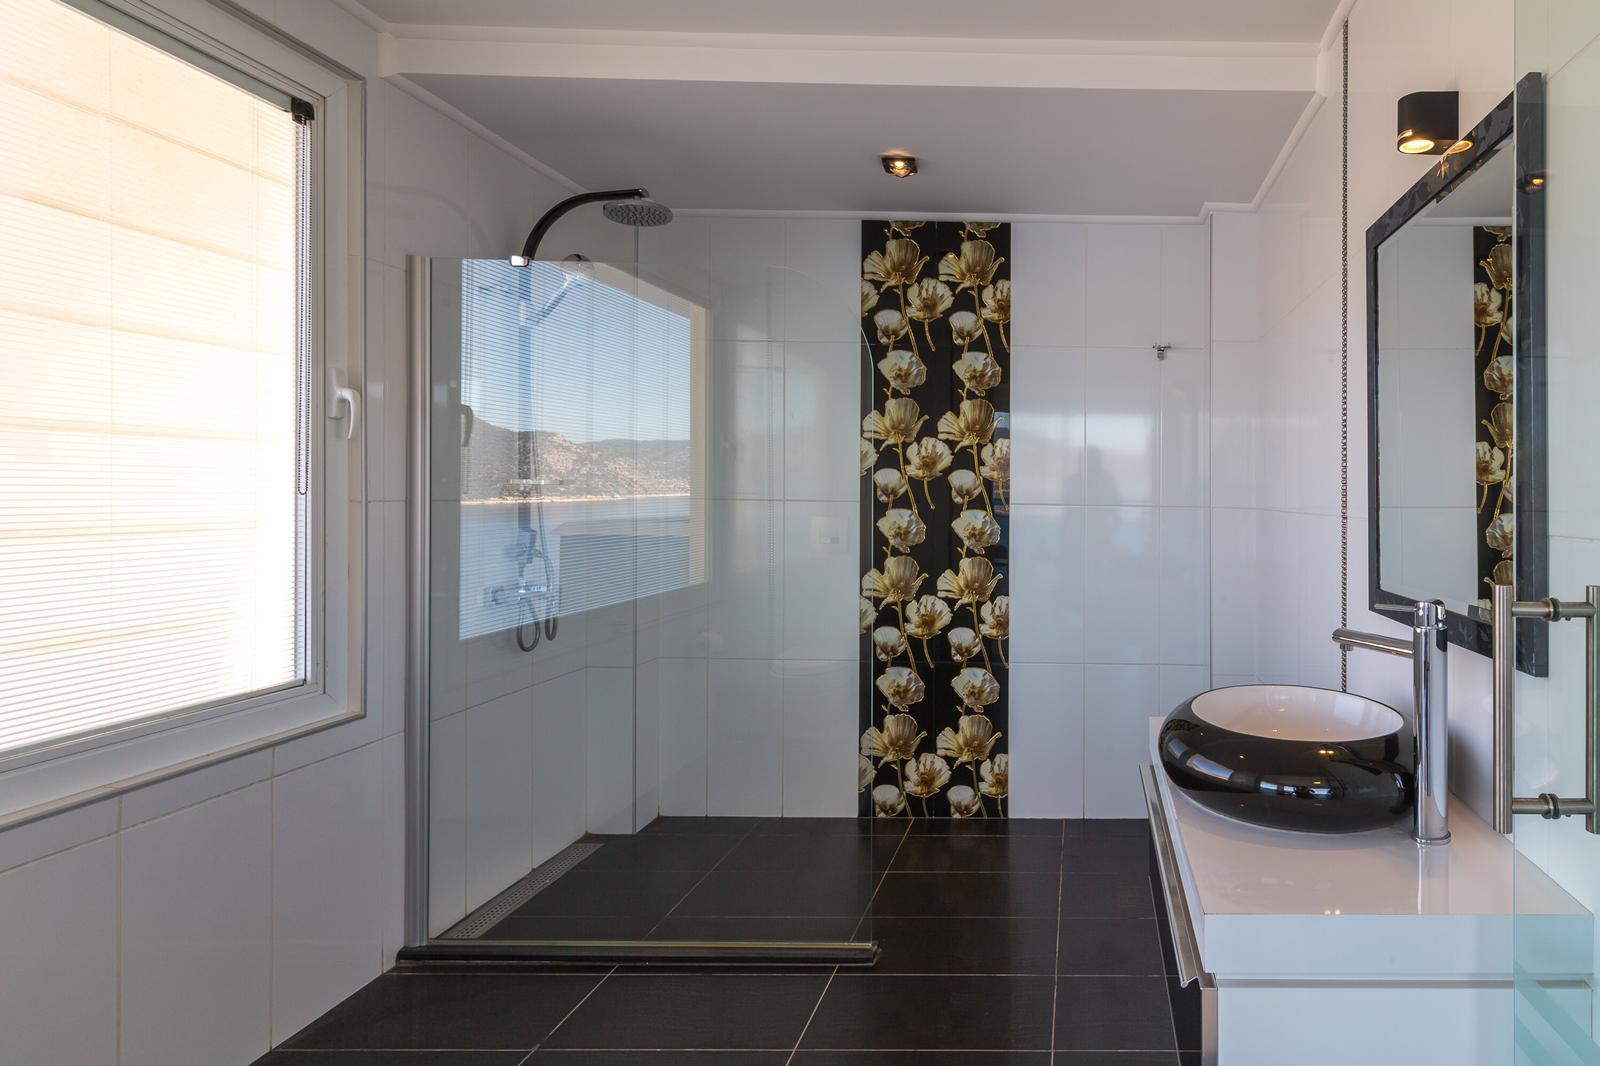 everest flower bathroom